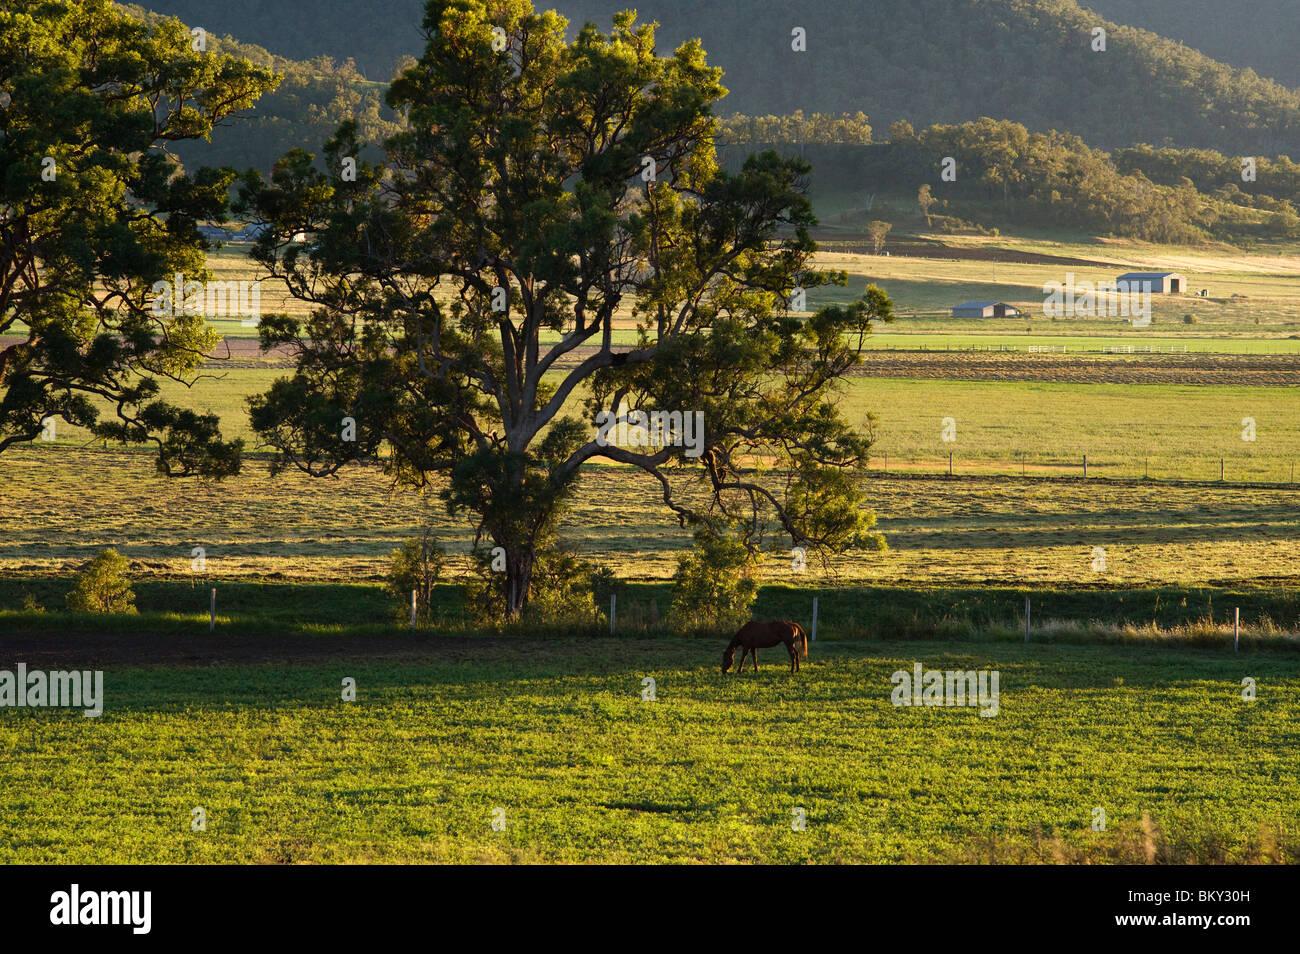 Farmland - Darling Downs - Stock Image